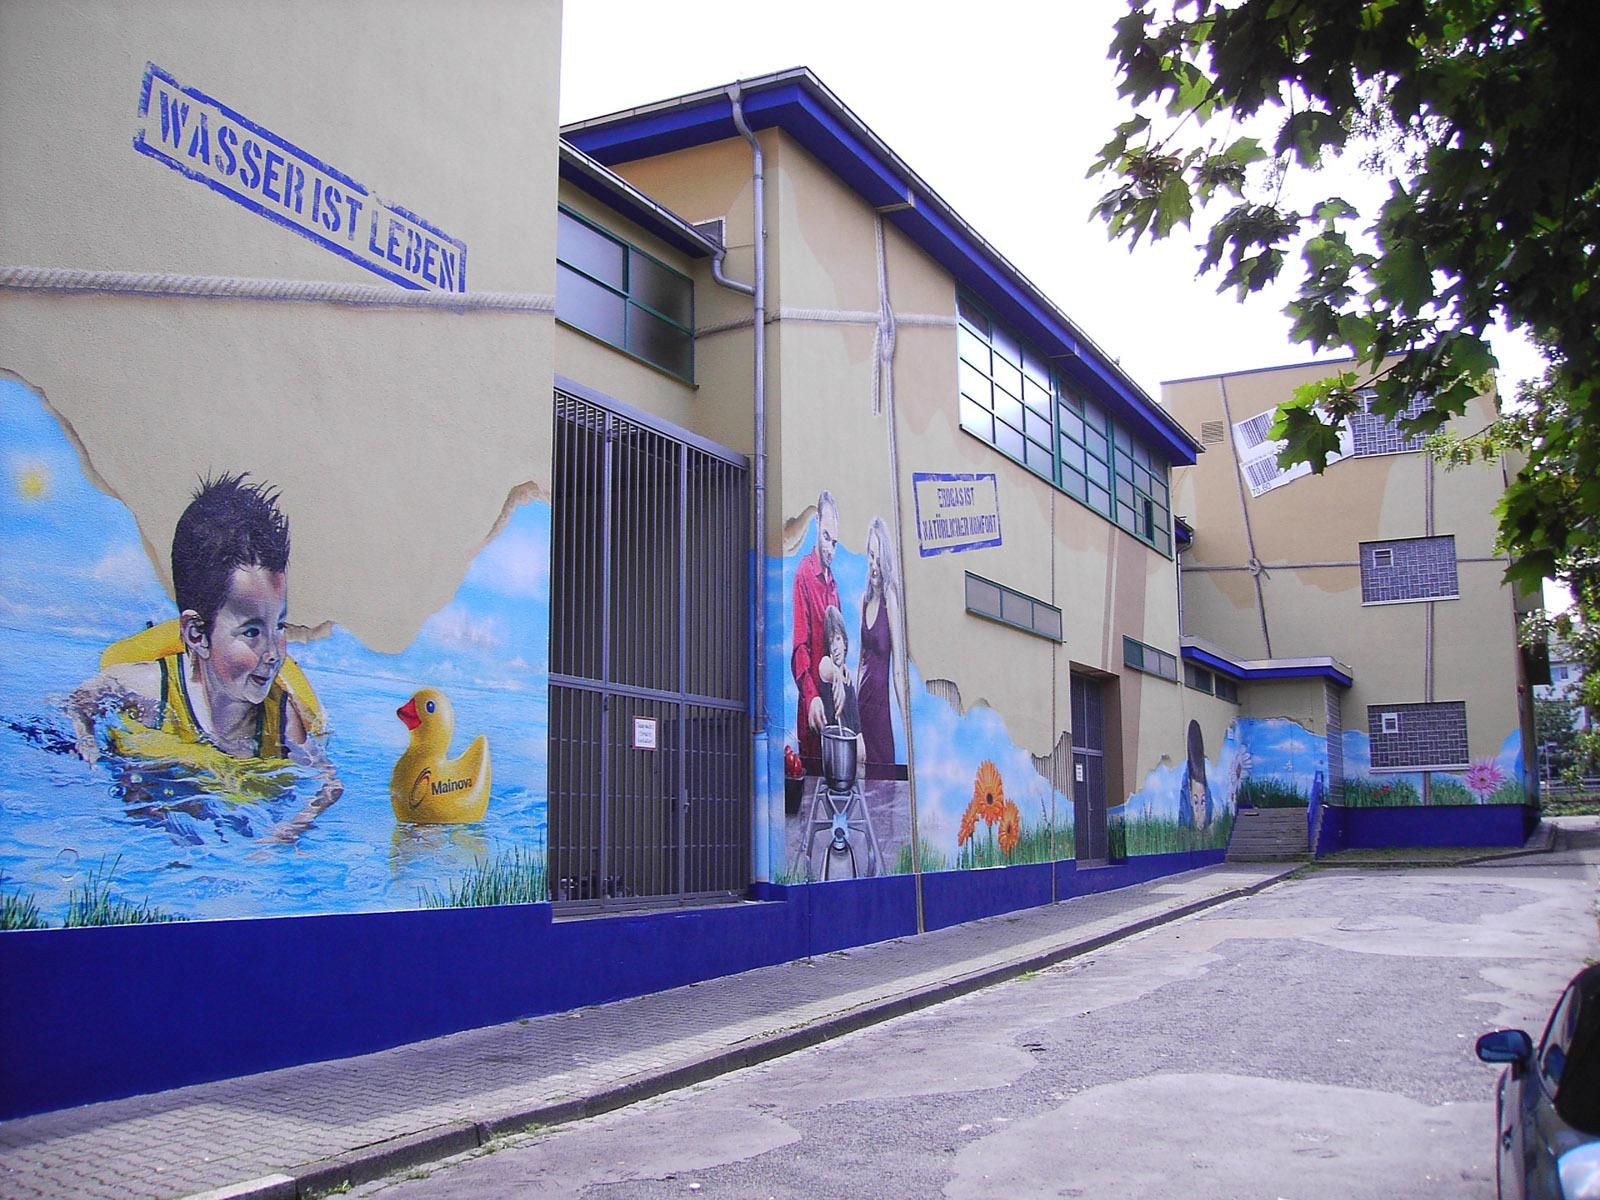 graffitiauftrag-graffitikuenstler-wandgestaltung-artmos4-mainova-frankfurt-menschen-pflanzen-fotorealistisch